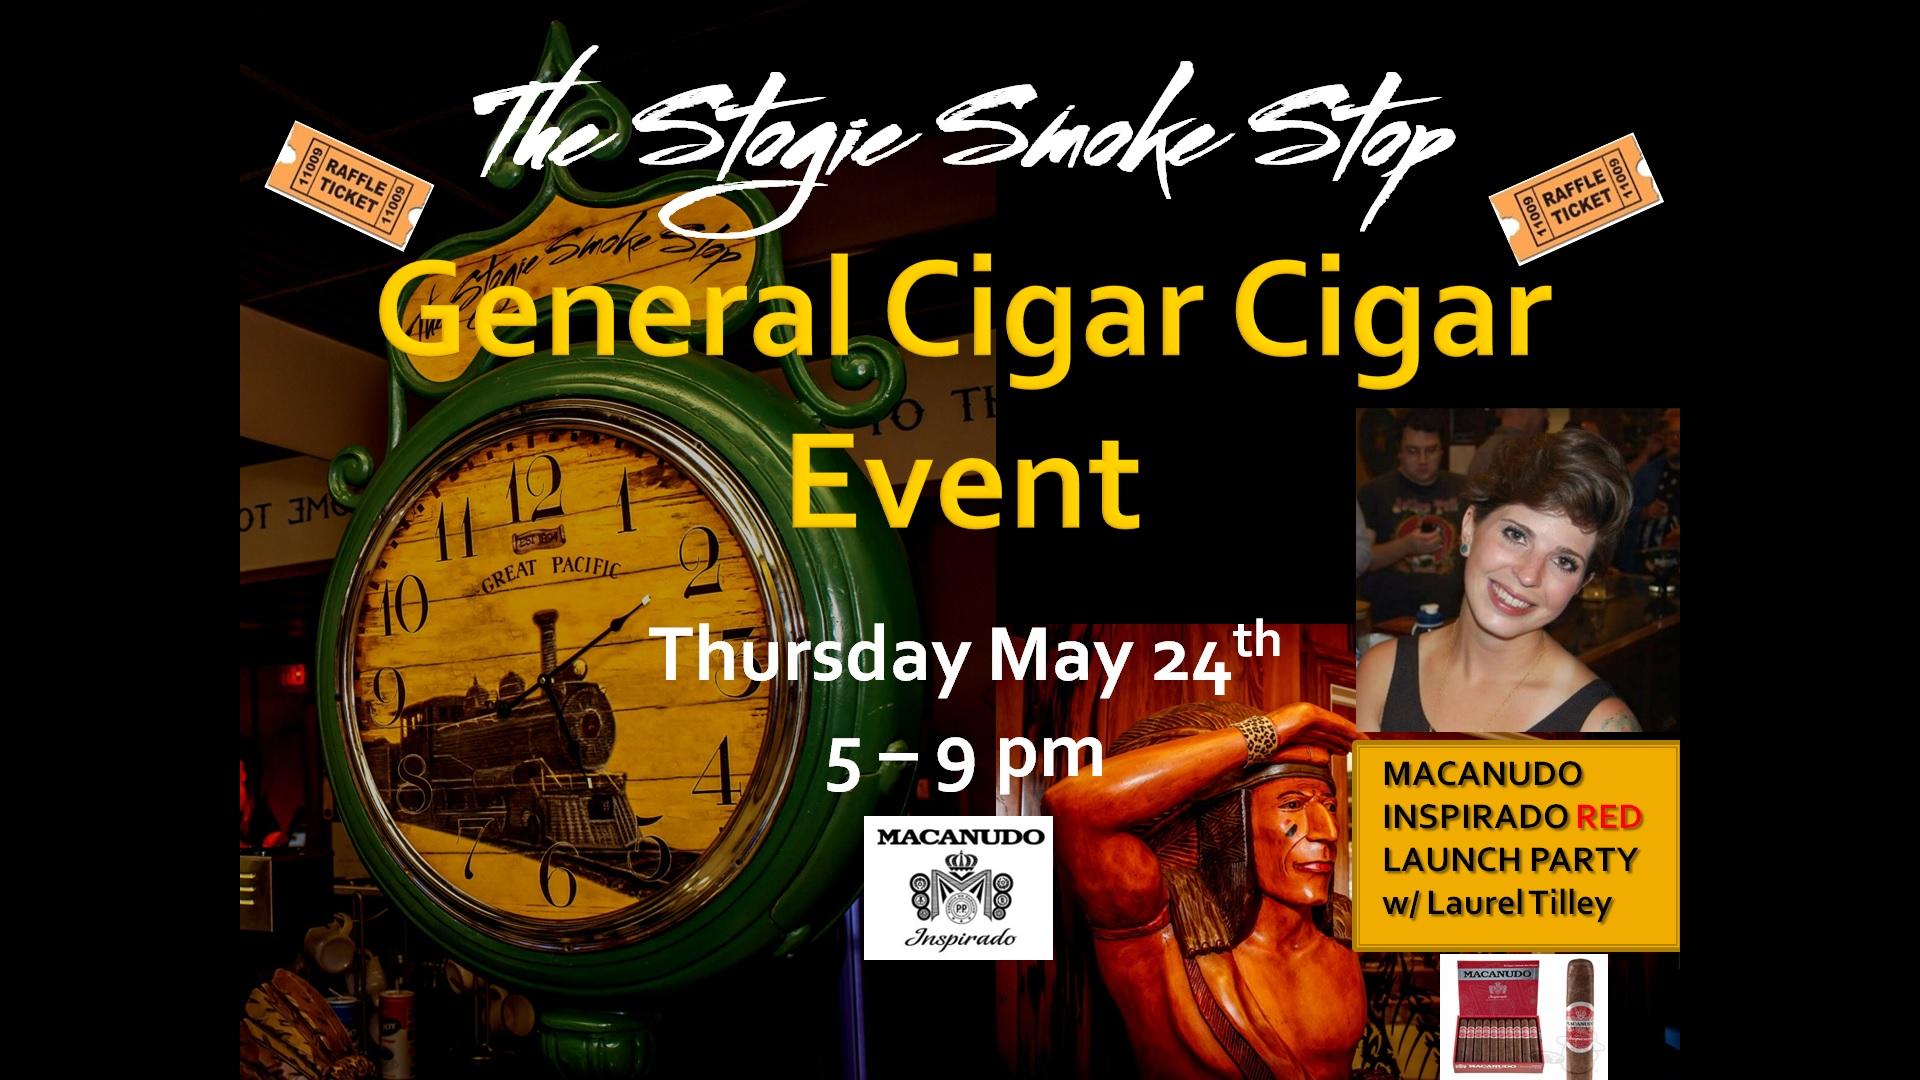 General Cigar Event w/ Laurel Tilley